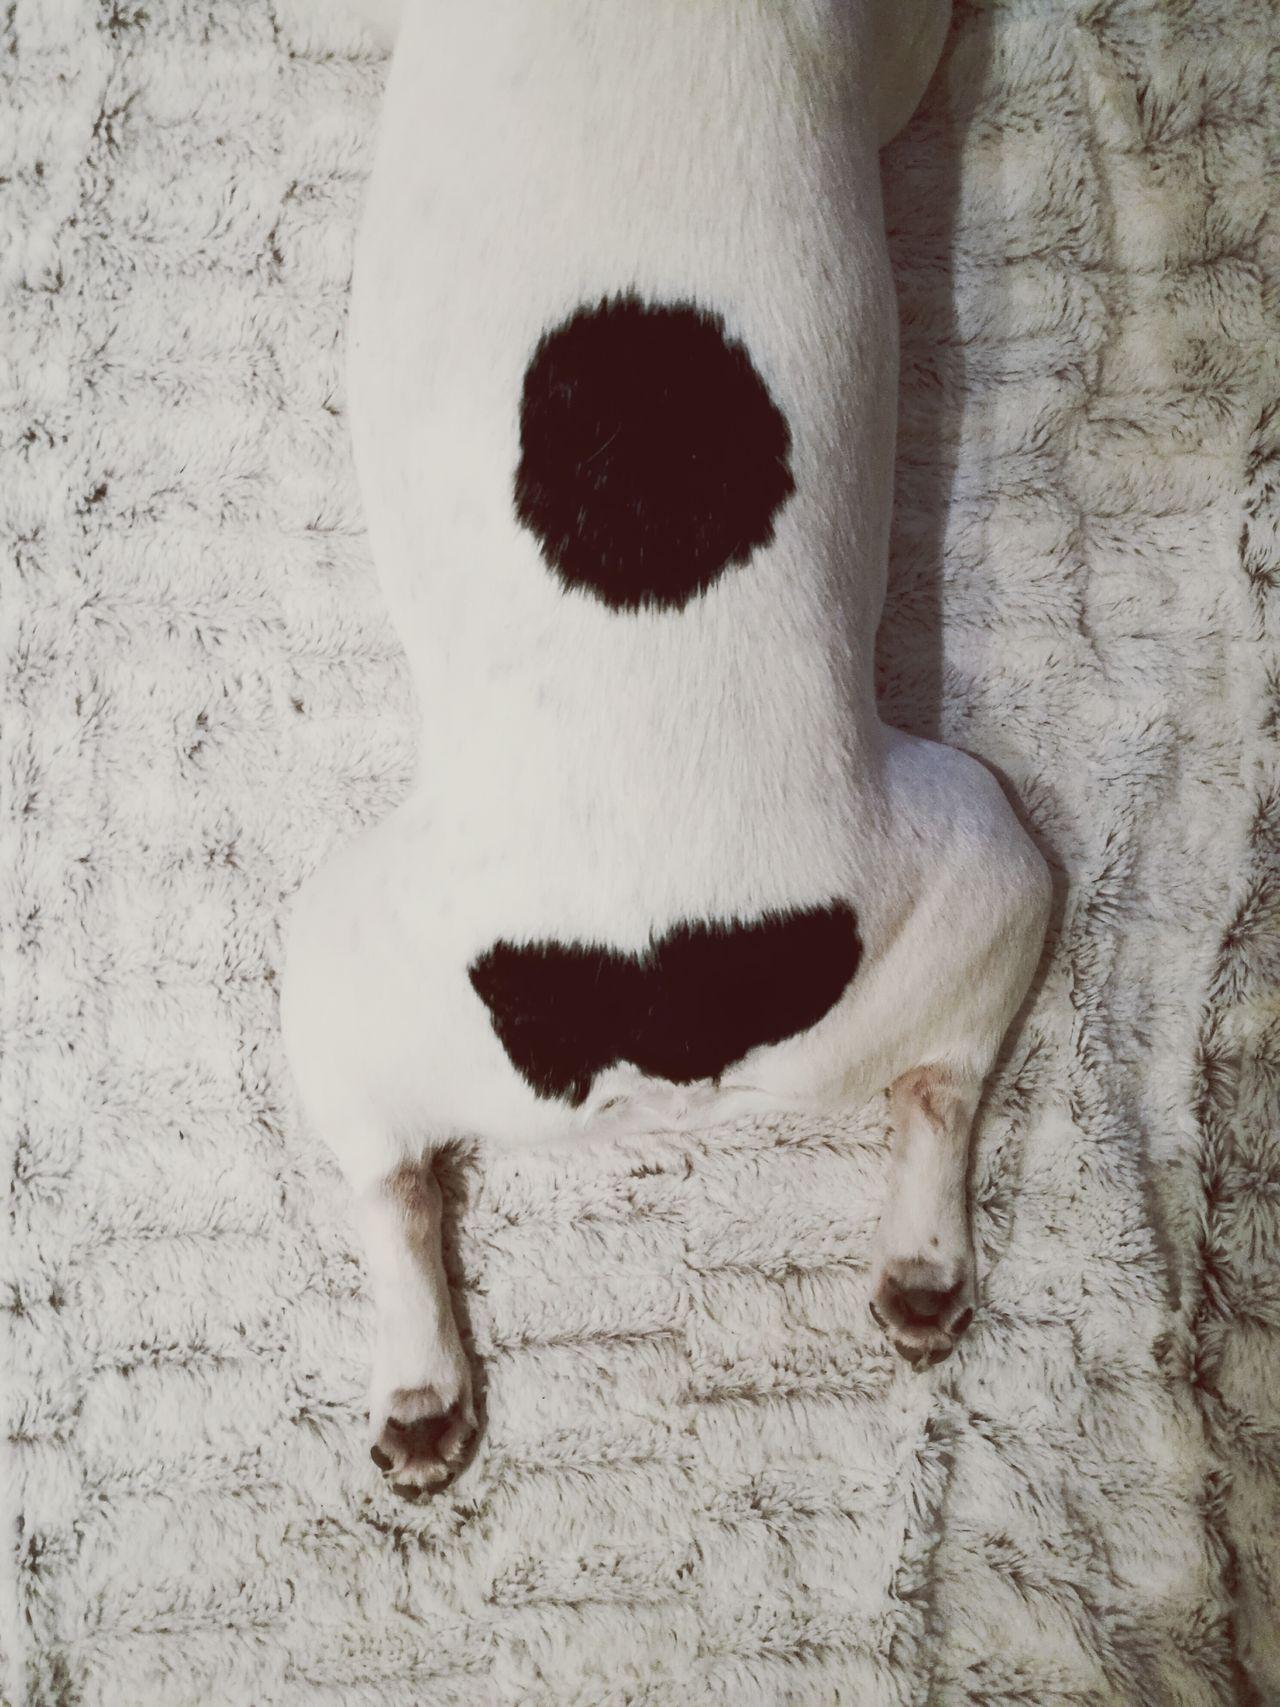 One Animal Dog Animal Themes Pets French Bulldog Frenchie Bully Paws Awkward Sleeping But Fur Blanket Cozy Funny Sleepingposition